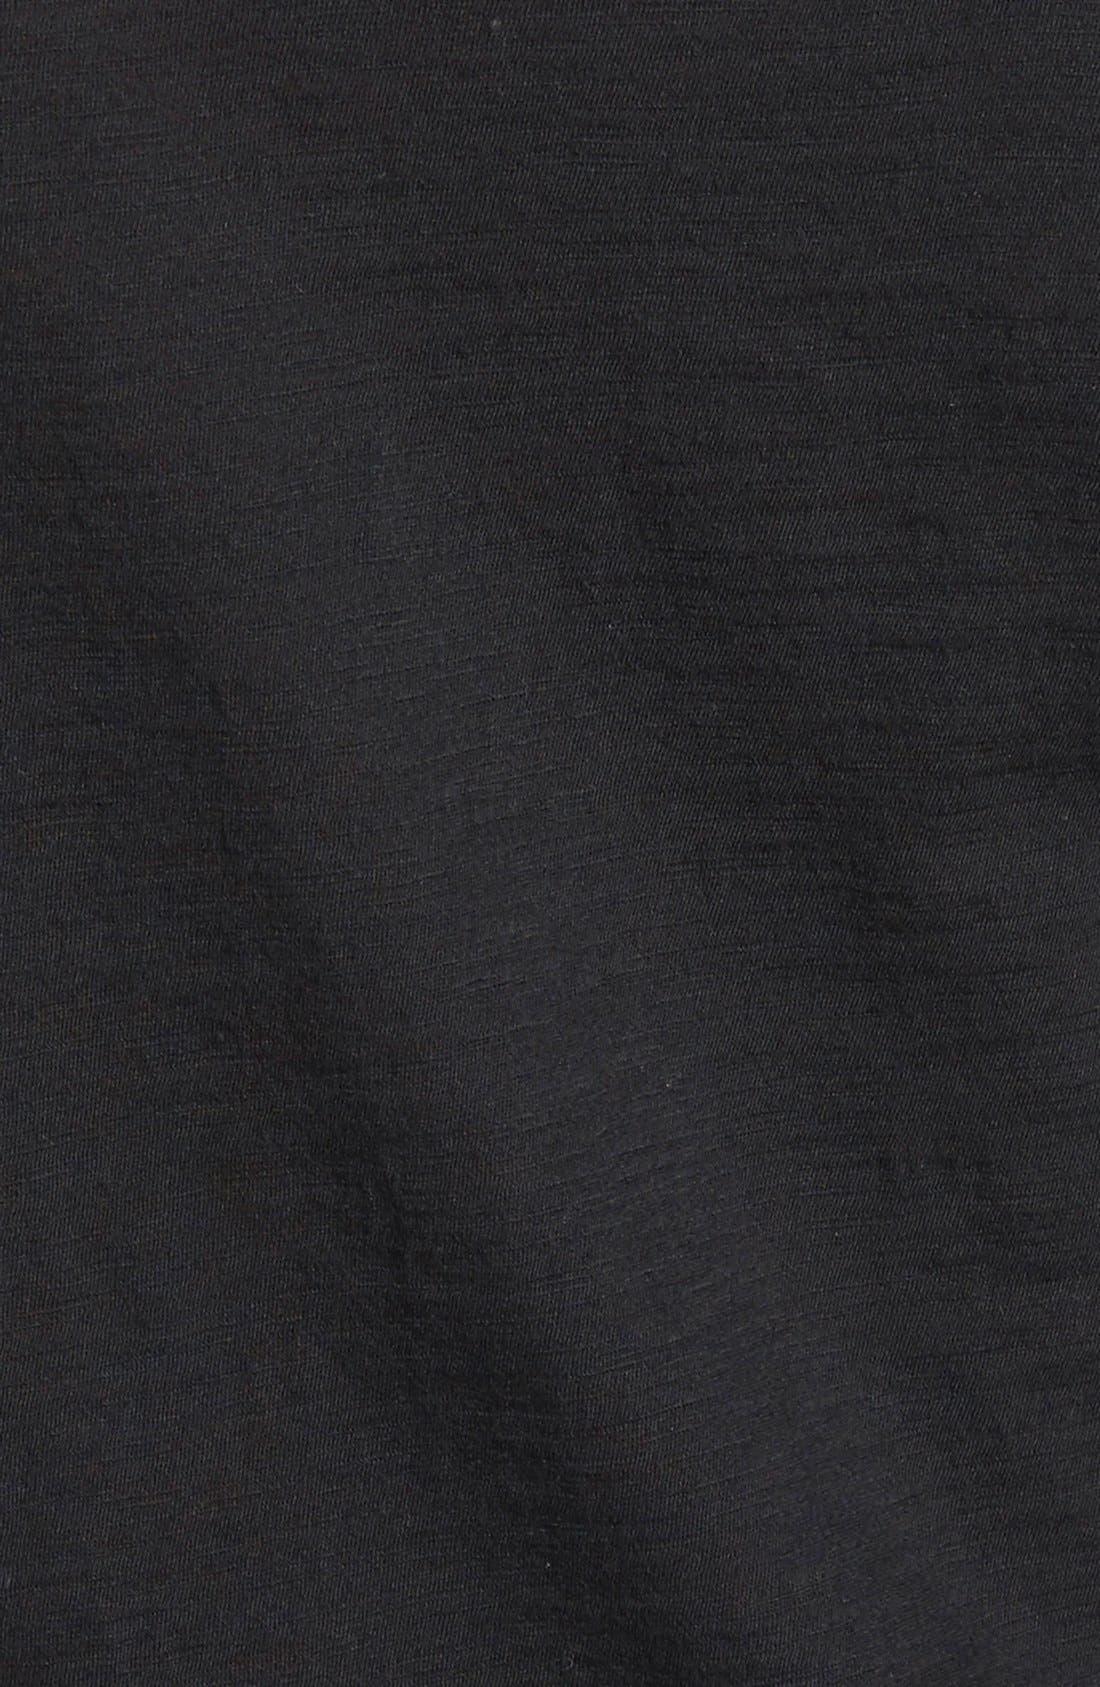 Alternate Image 3  - Proenza Schouler Tissue Jersey Long Sleeve Tee